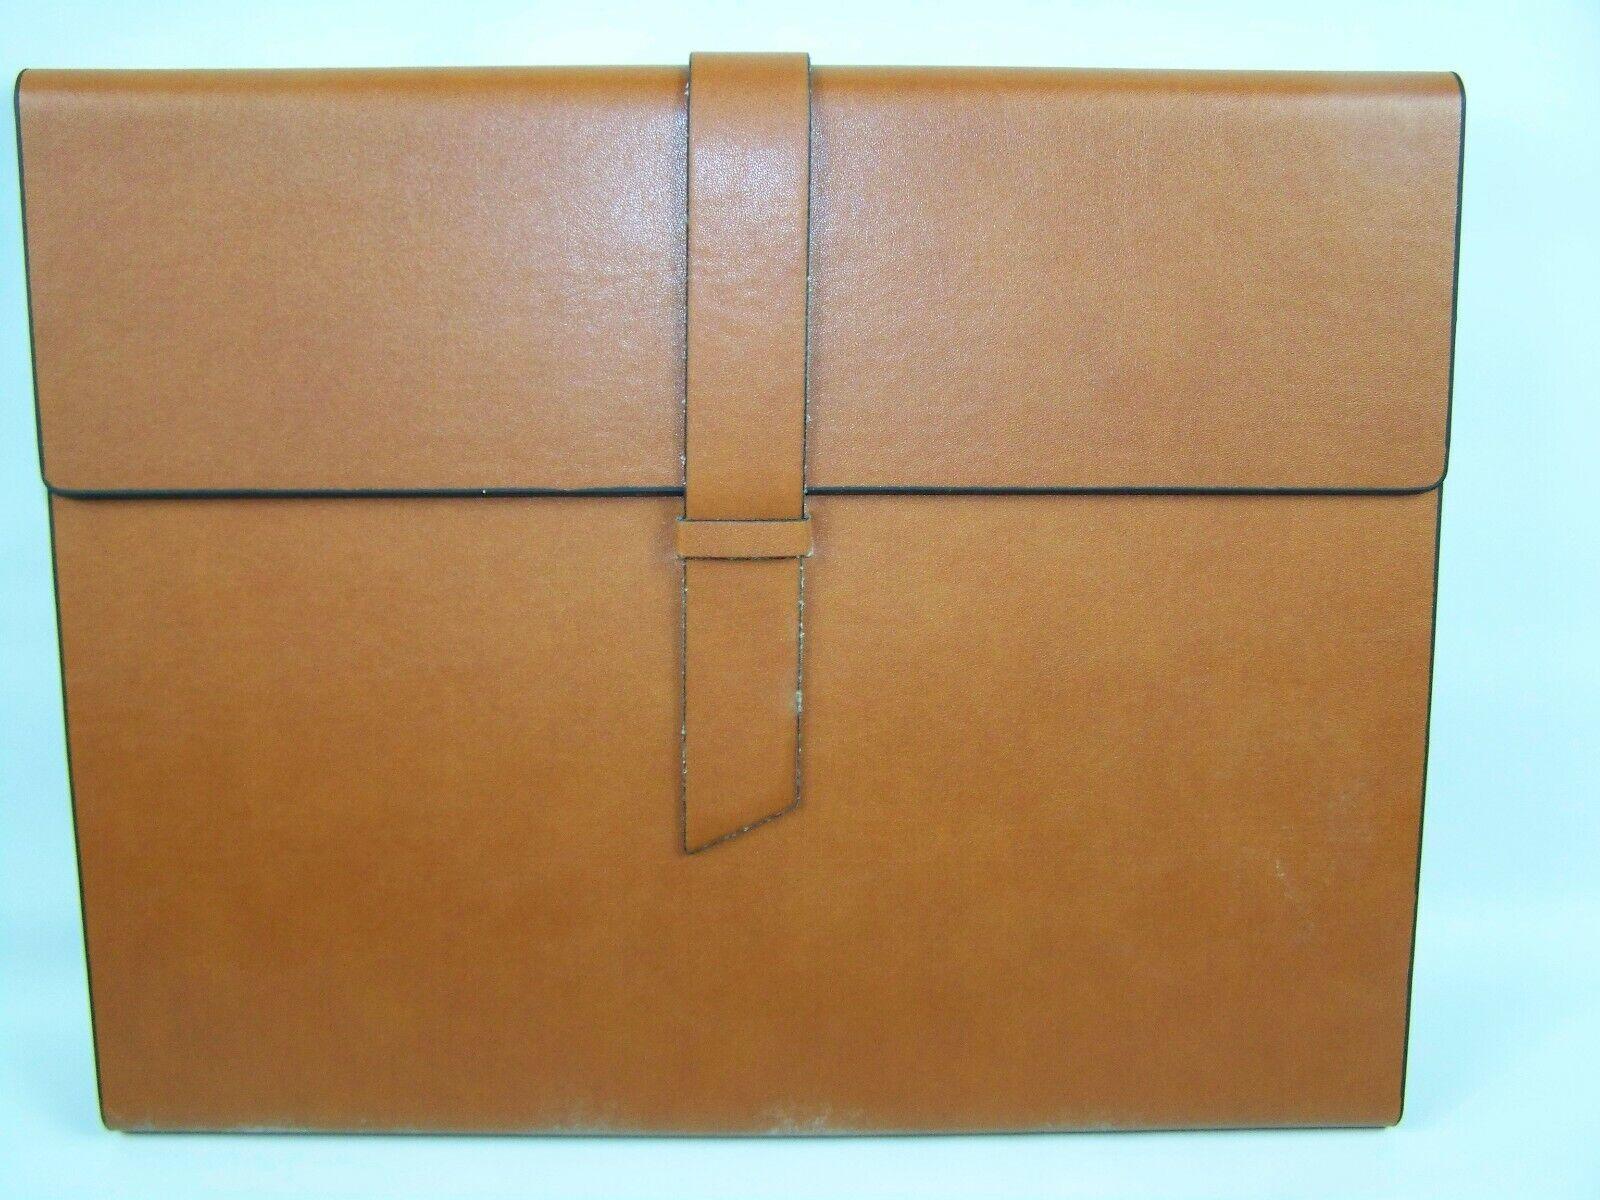 Gallaway Leather Padfolio Portfolio Folder Light Brown New i